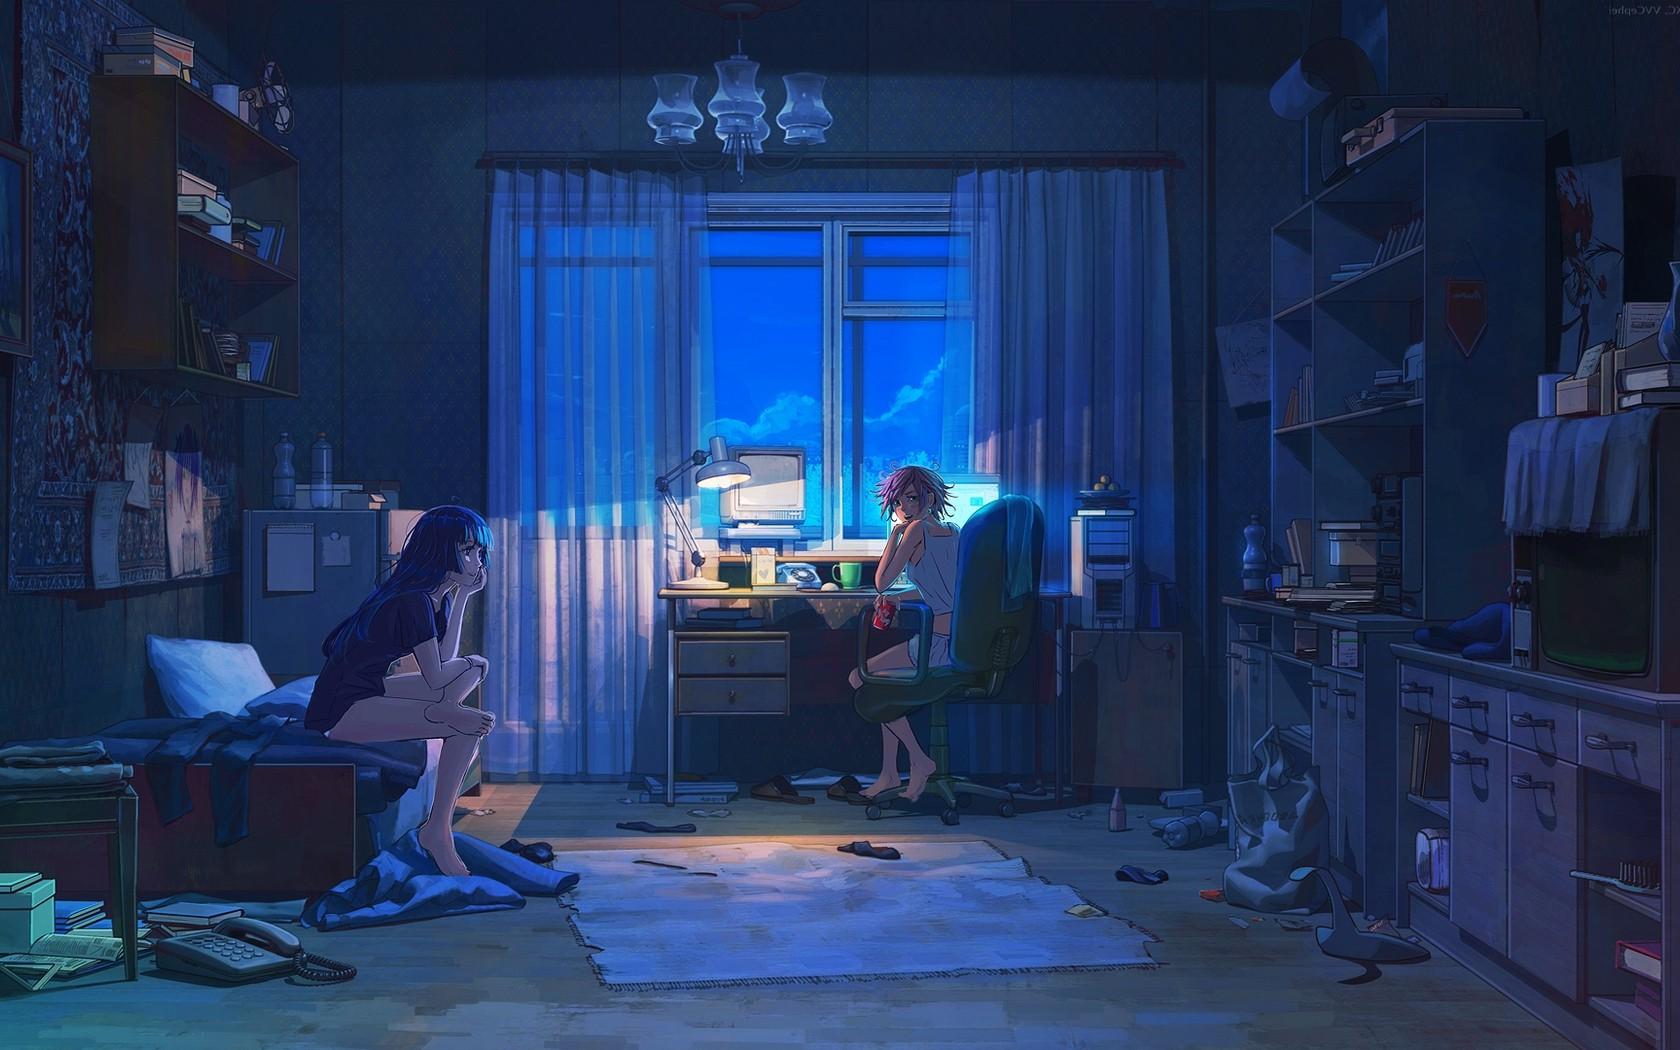 Art Girl Room Anime Hd Wallpaper Important Wallpapers 1680x1050